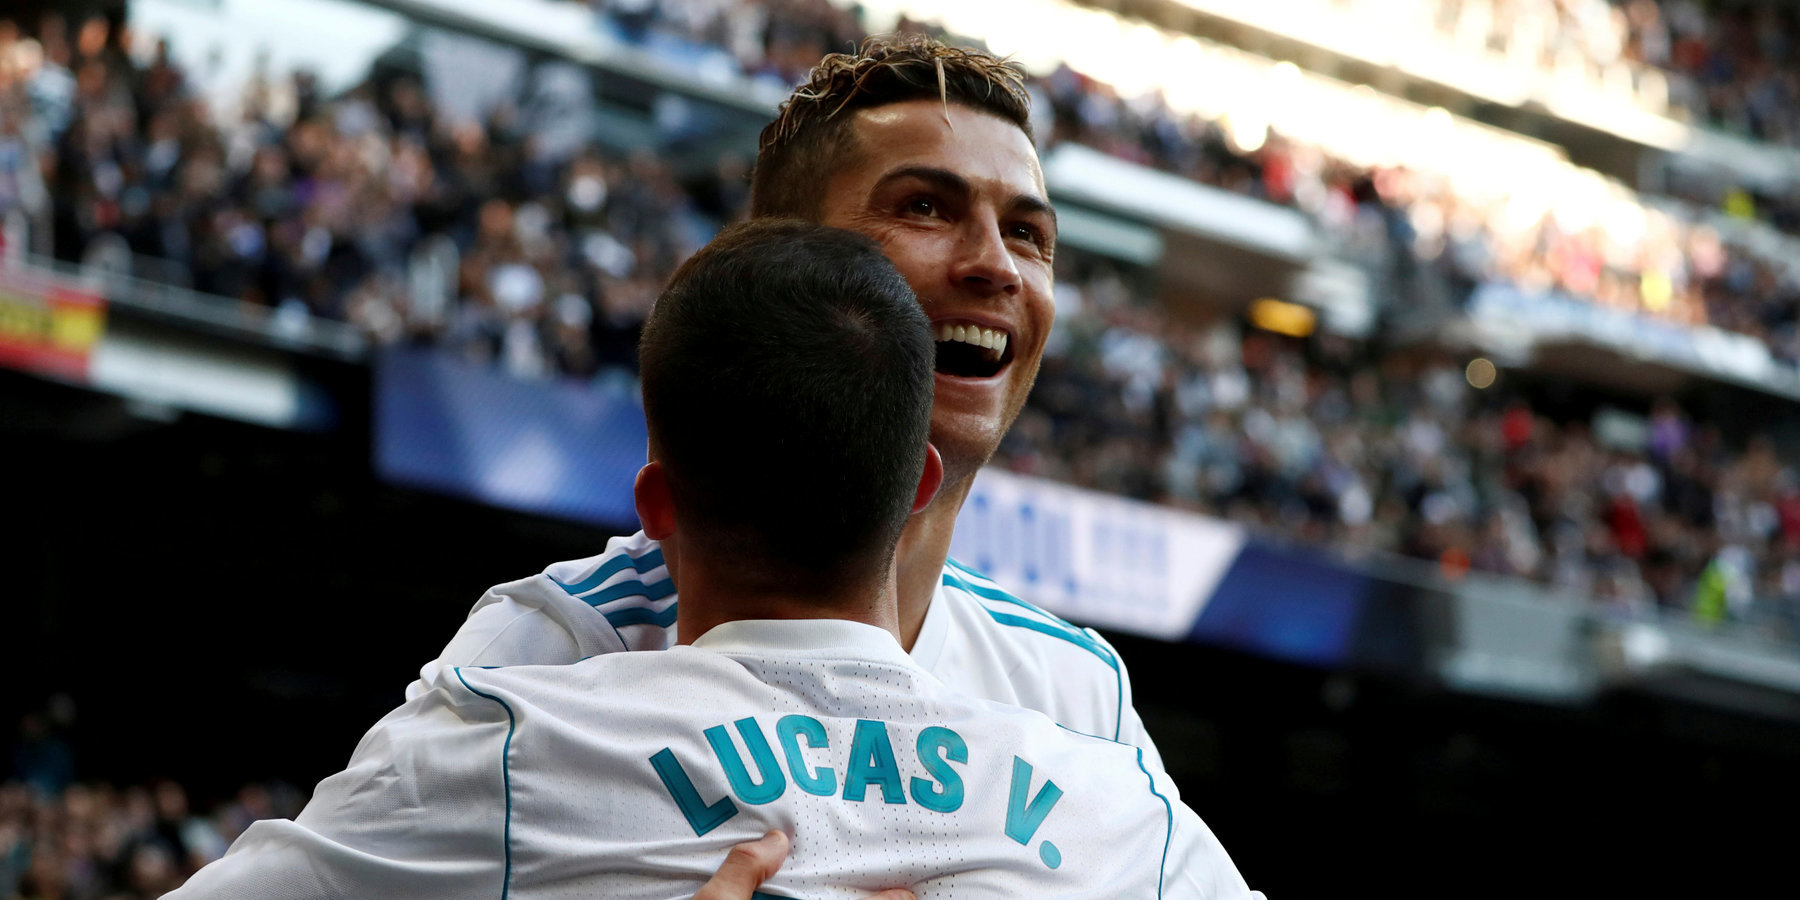 «Реал» разгромил «Жирону» в29-м туре чемпионата Испании, Роналду оформил покер